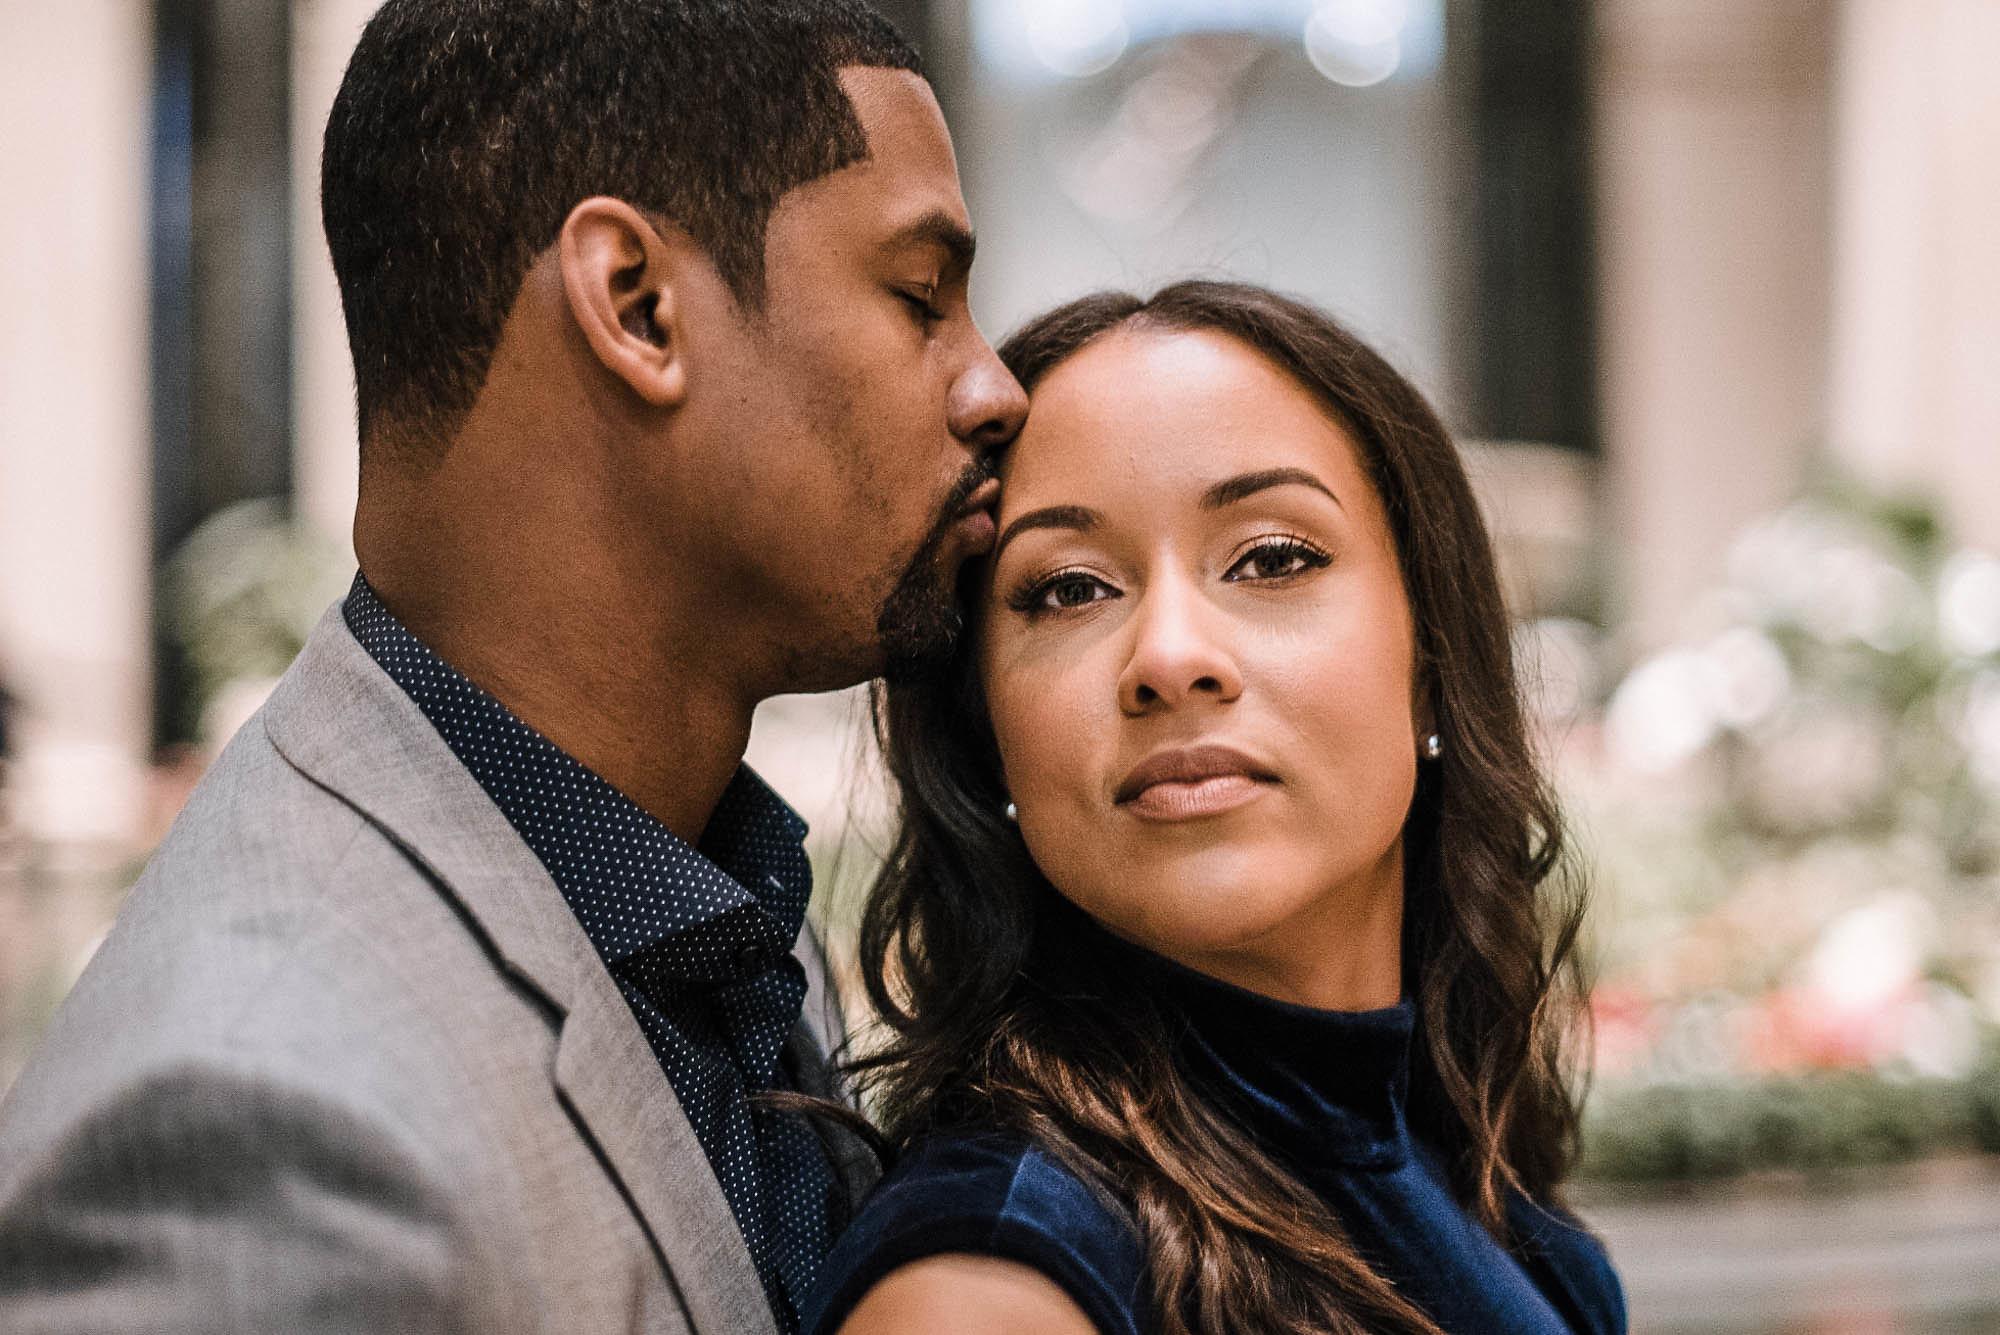 Man kissing fiance's forehead